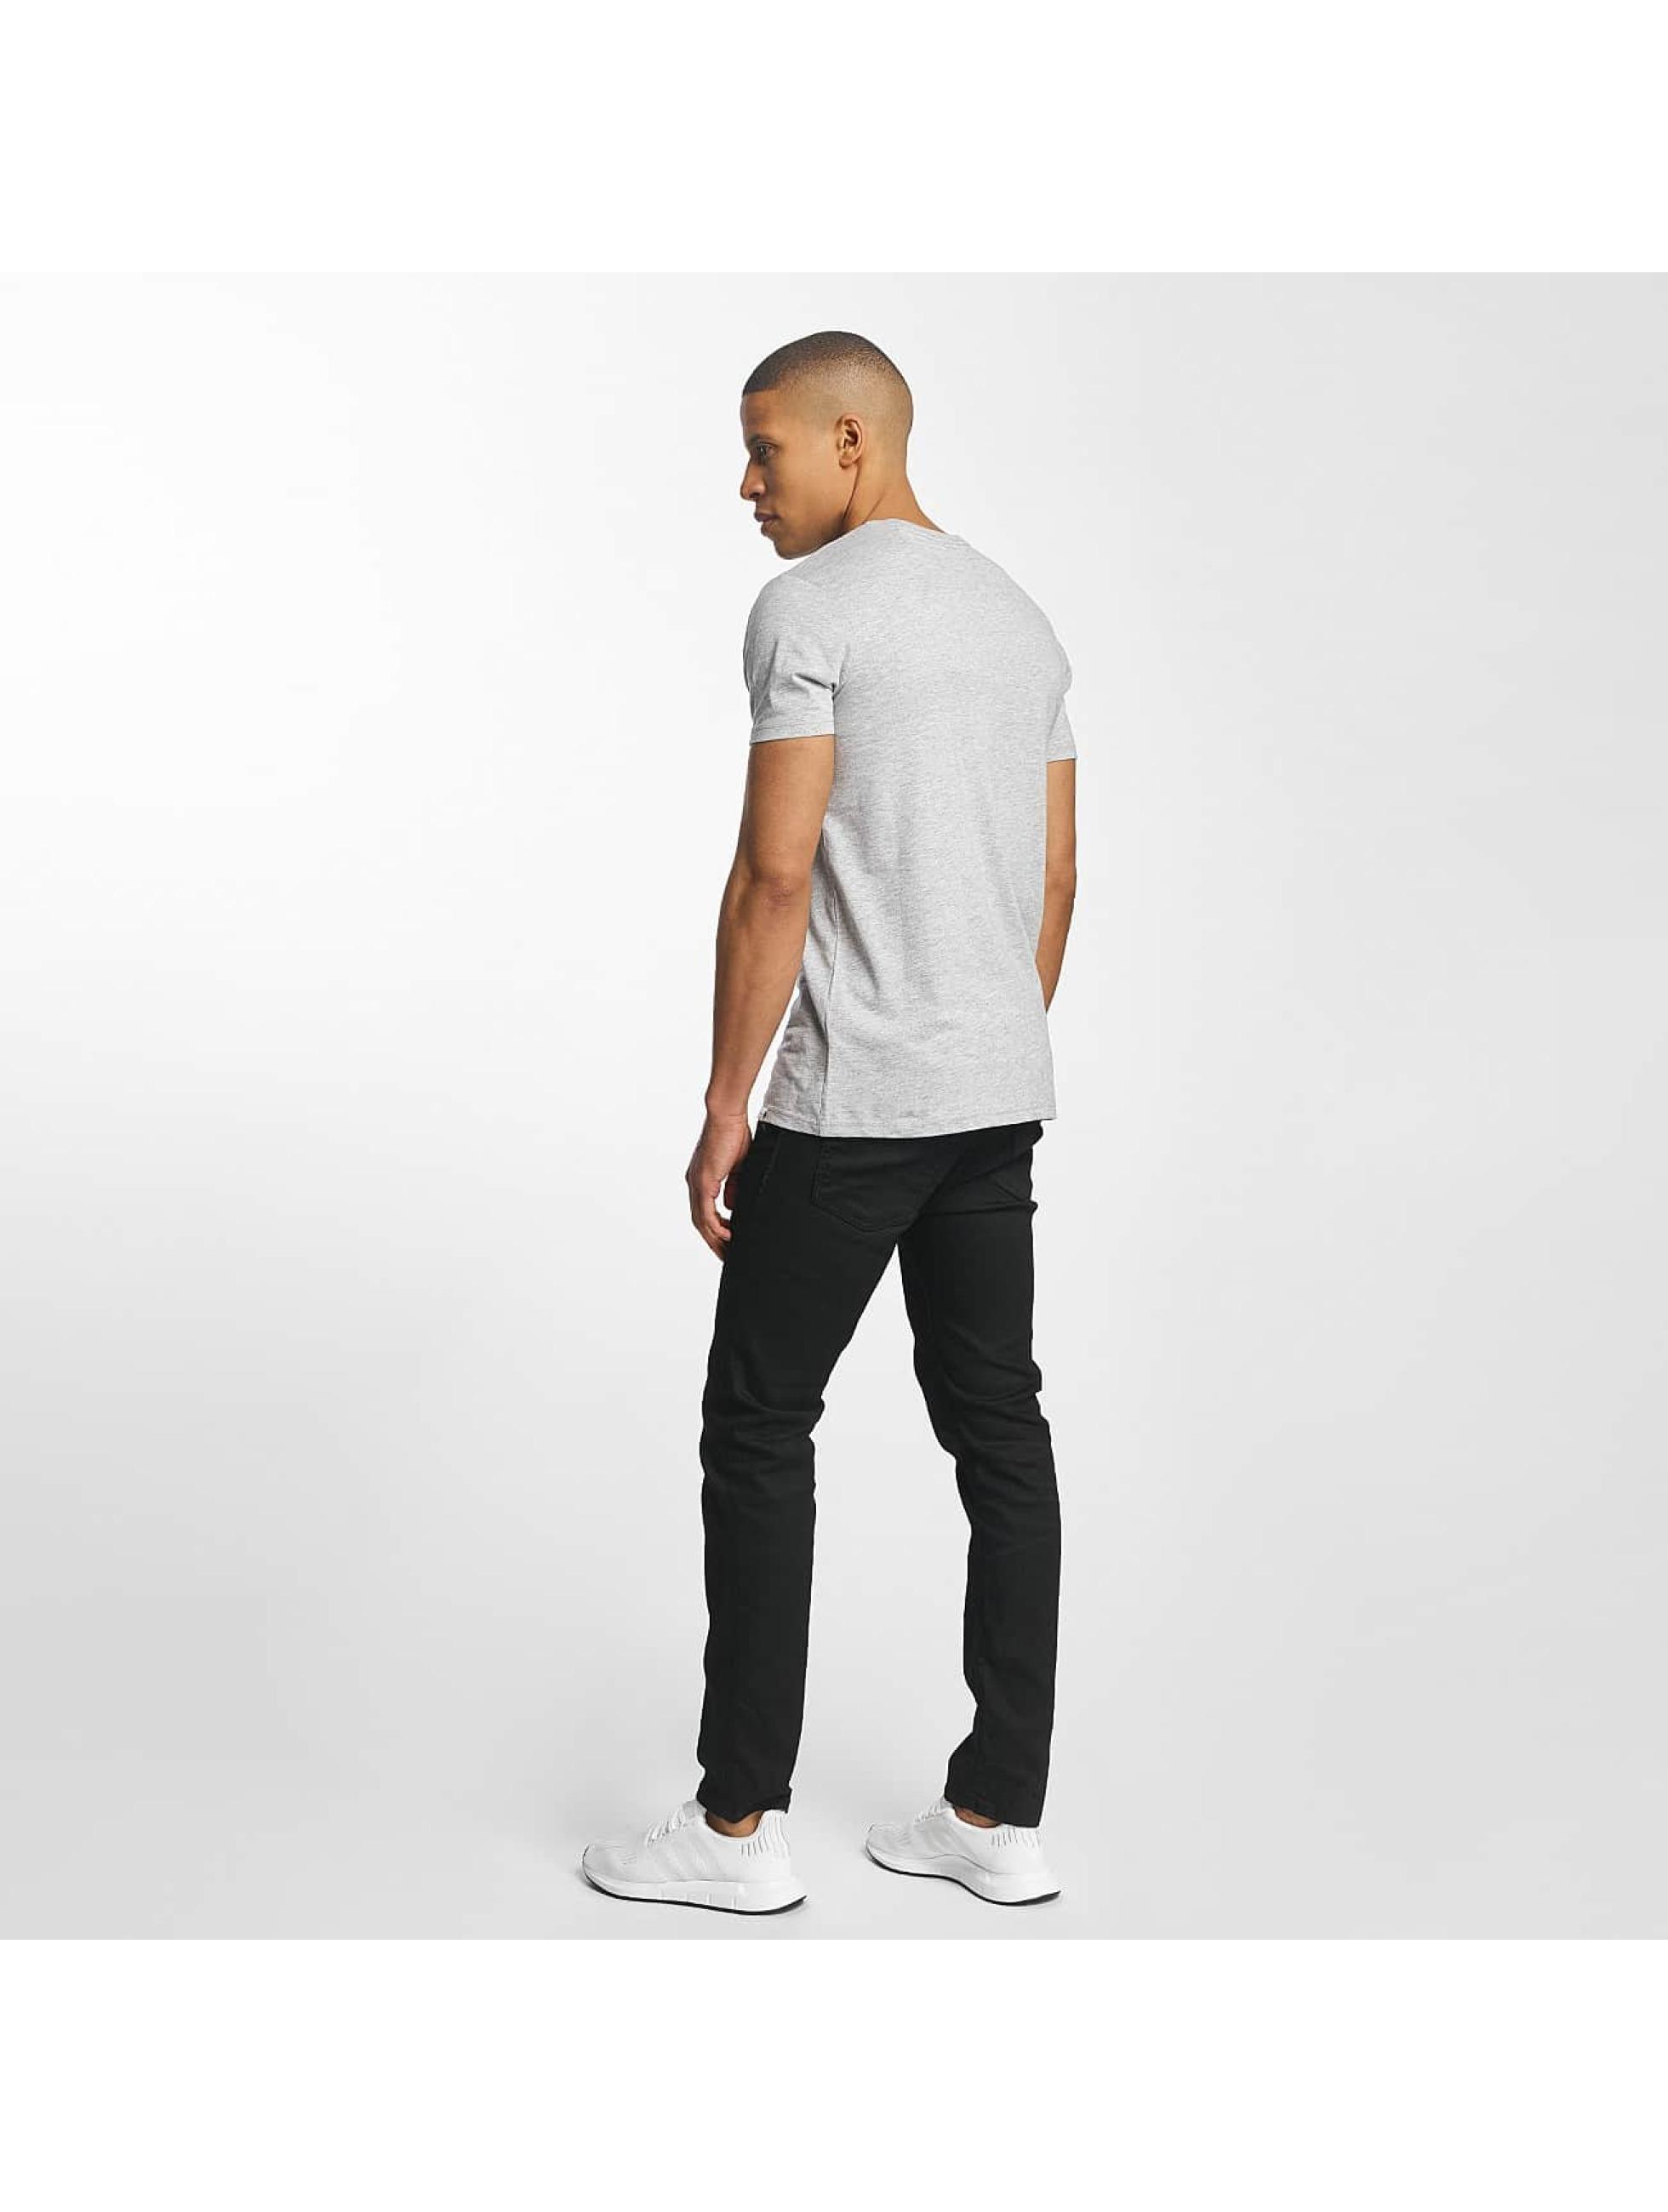 SHINE Original T-Shirt Barret Photo Print grey